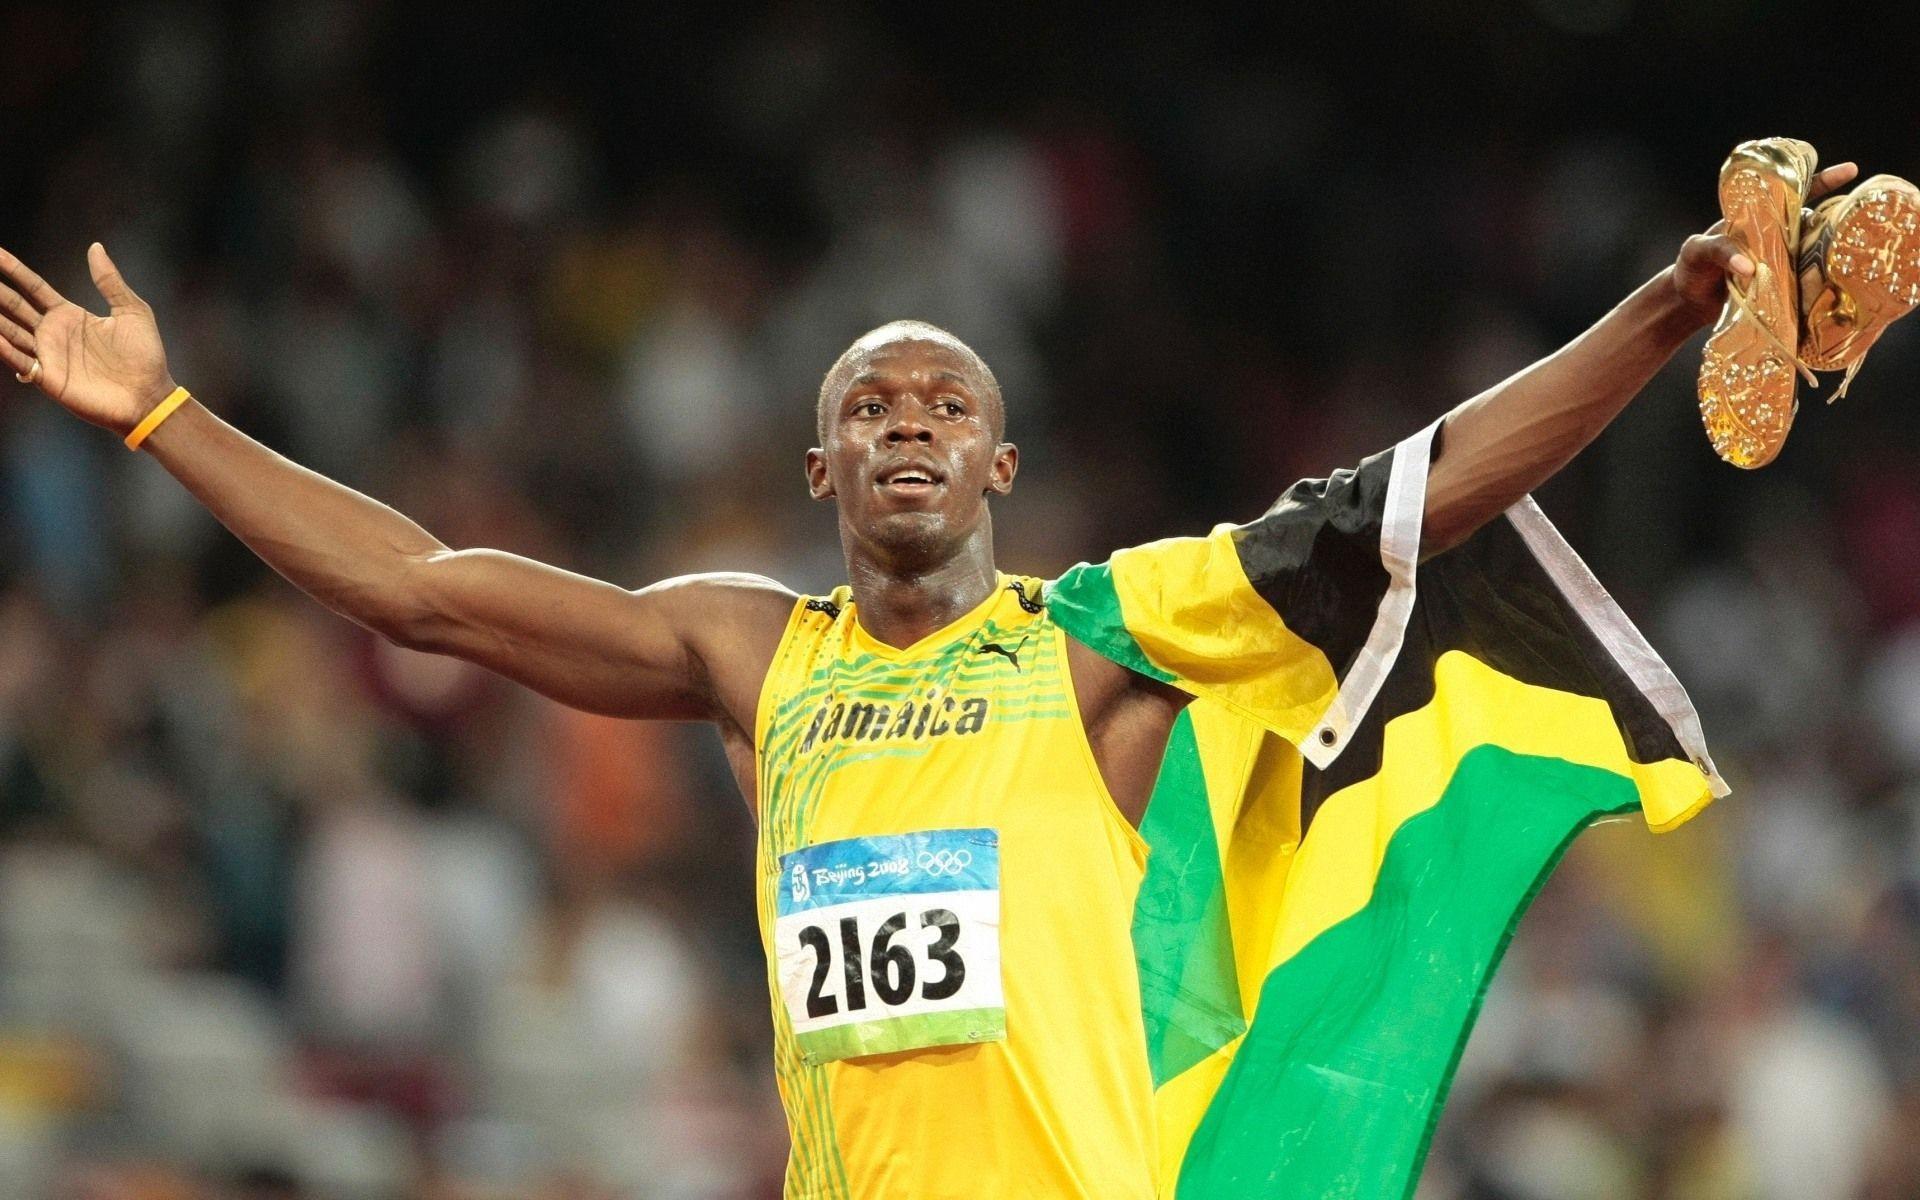 Usain Bolt Wallpaper 68 Pictures